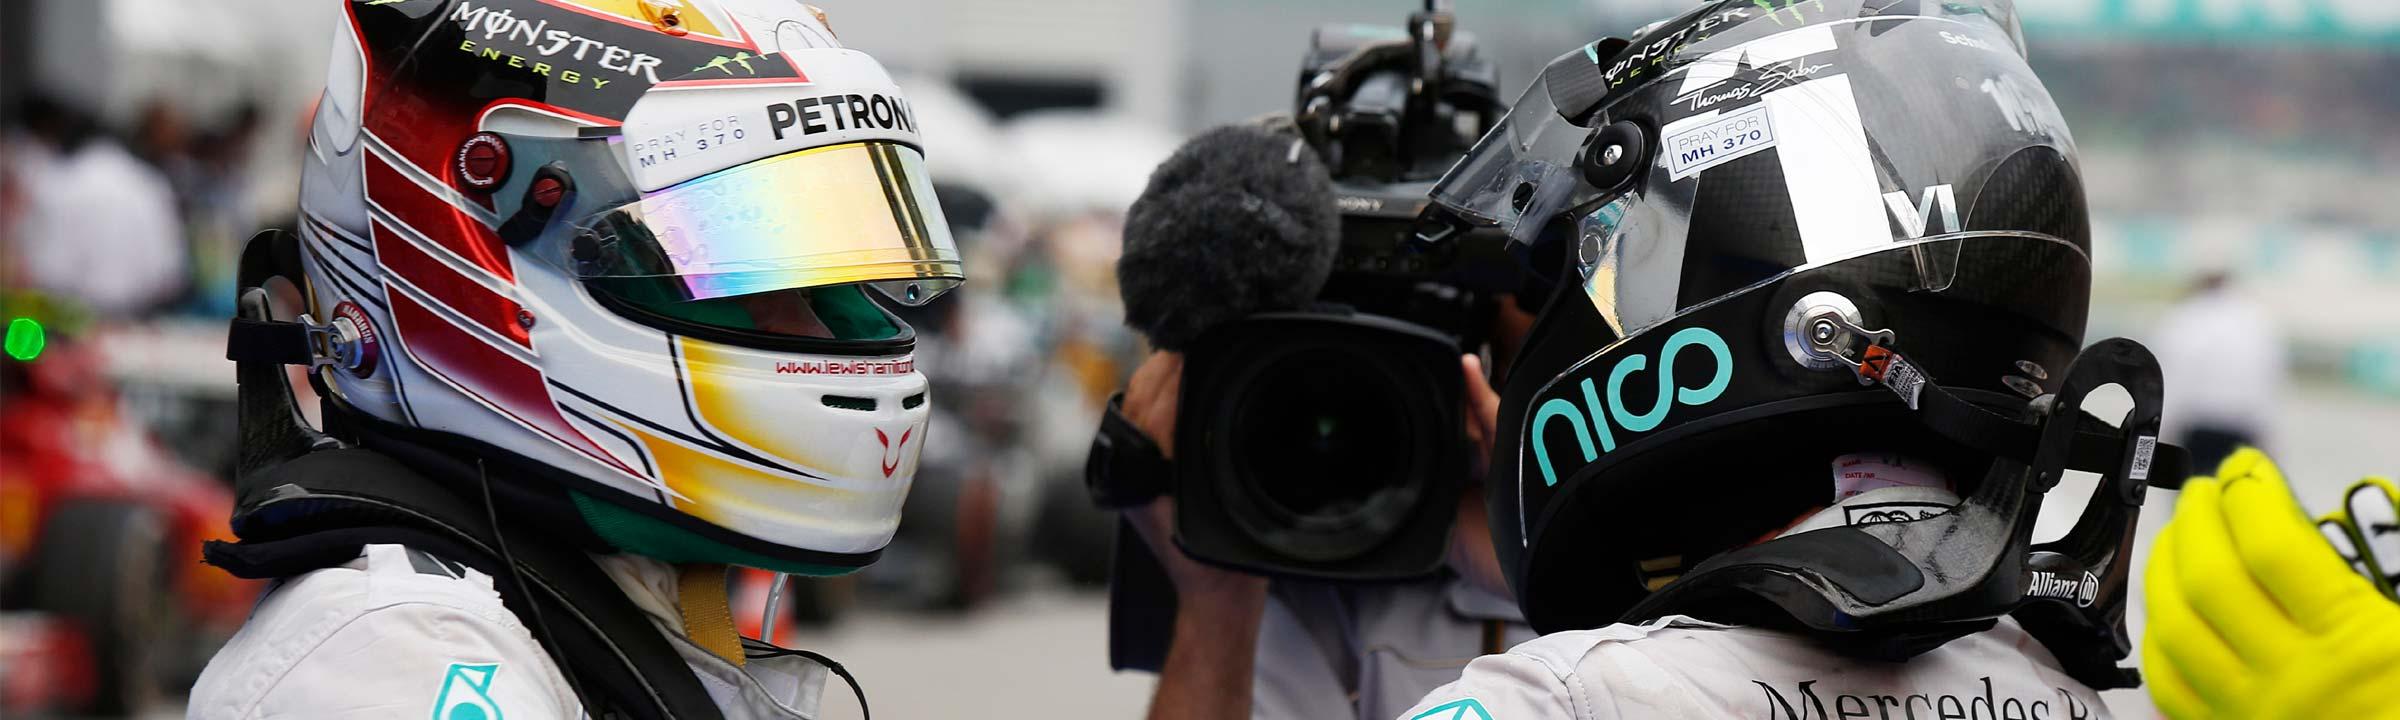 Lewis Hamilton and Nico Rosberg Rivalry